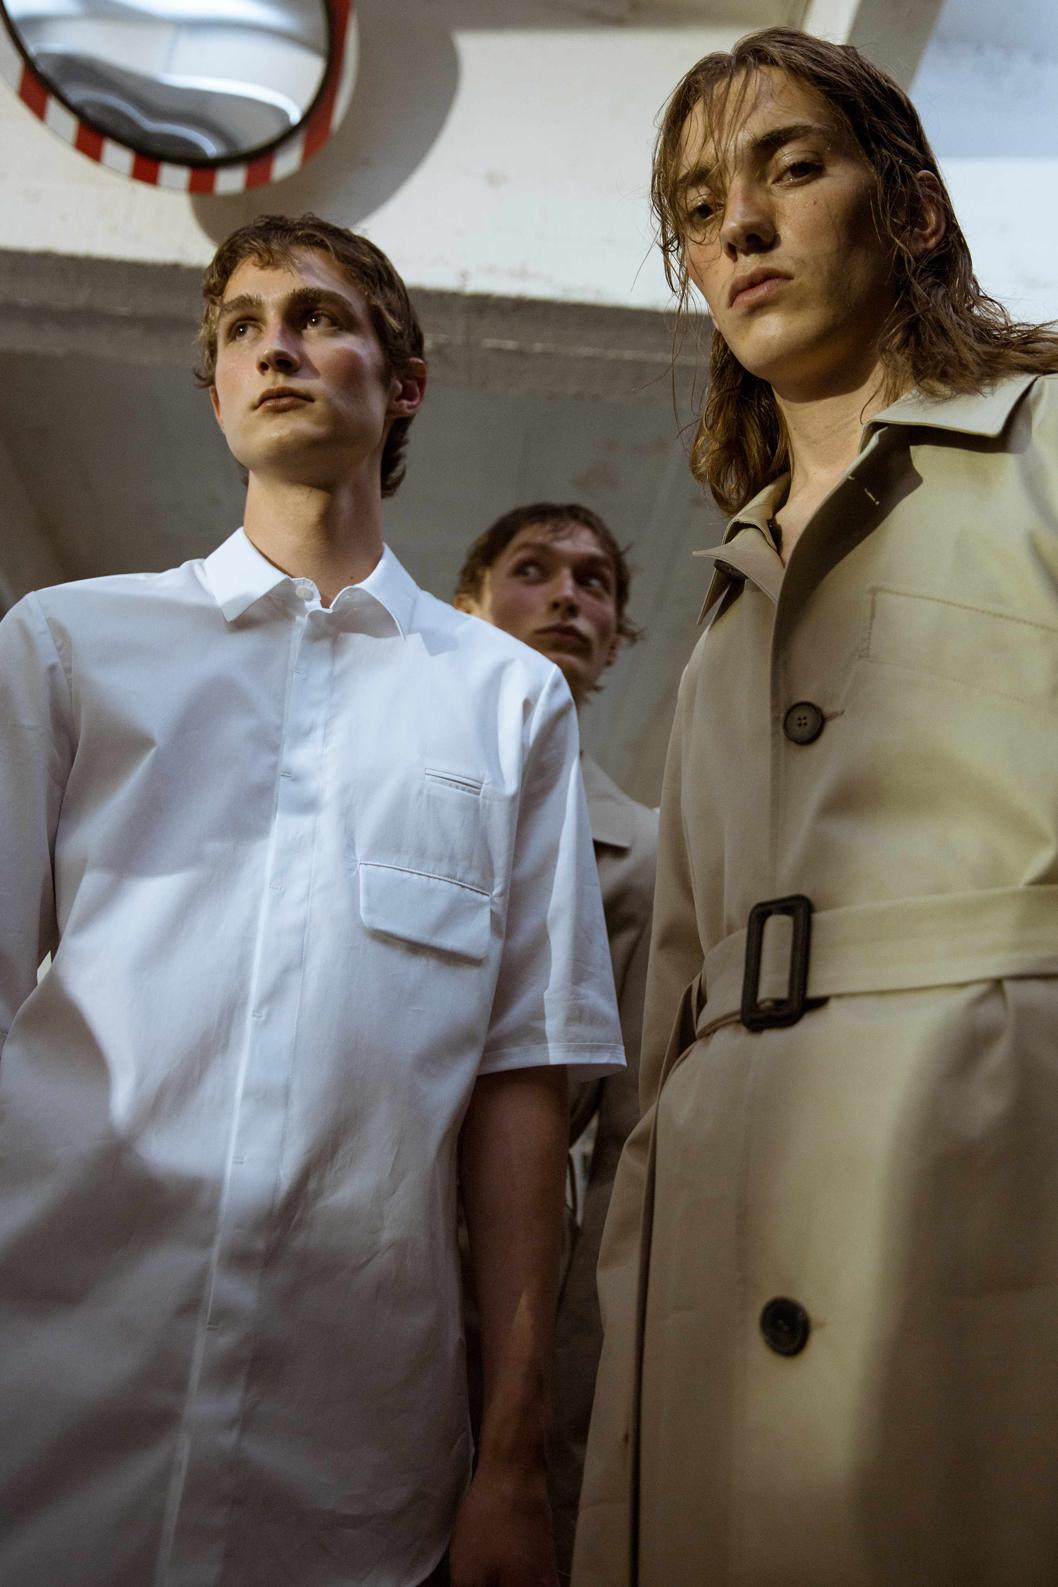 Backstage-22-4_hommes-SS16-Juste-Magazine-Remi-Procureur-9